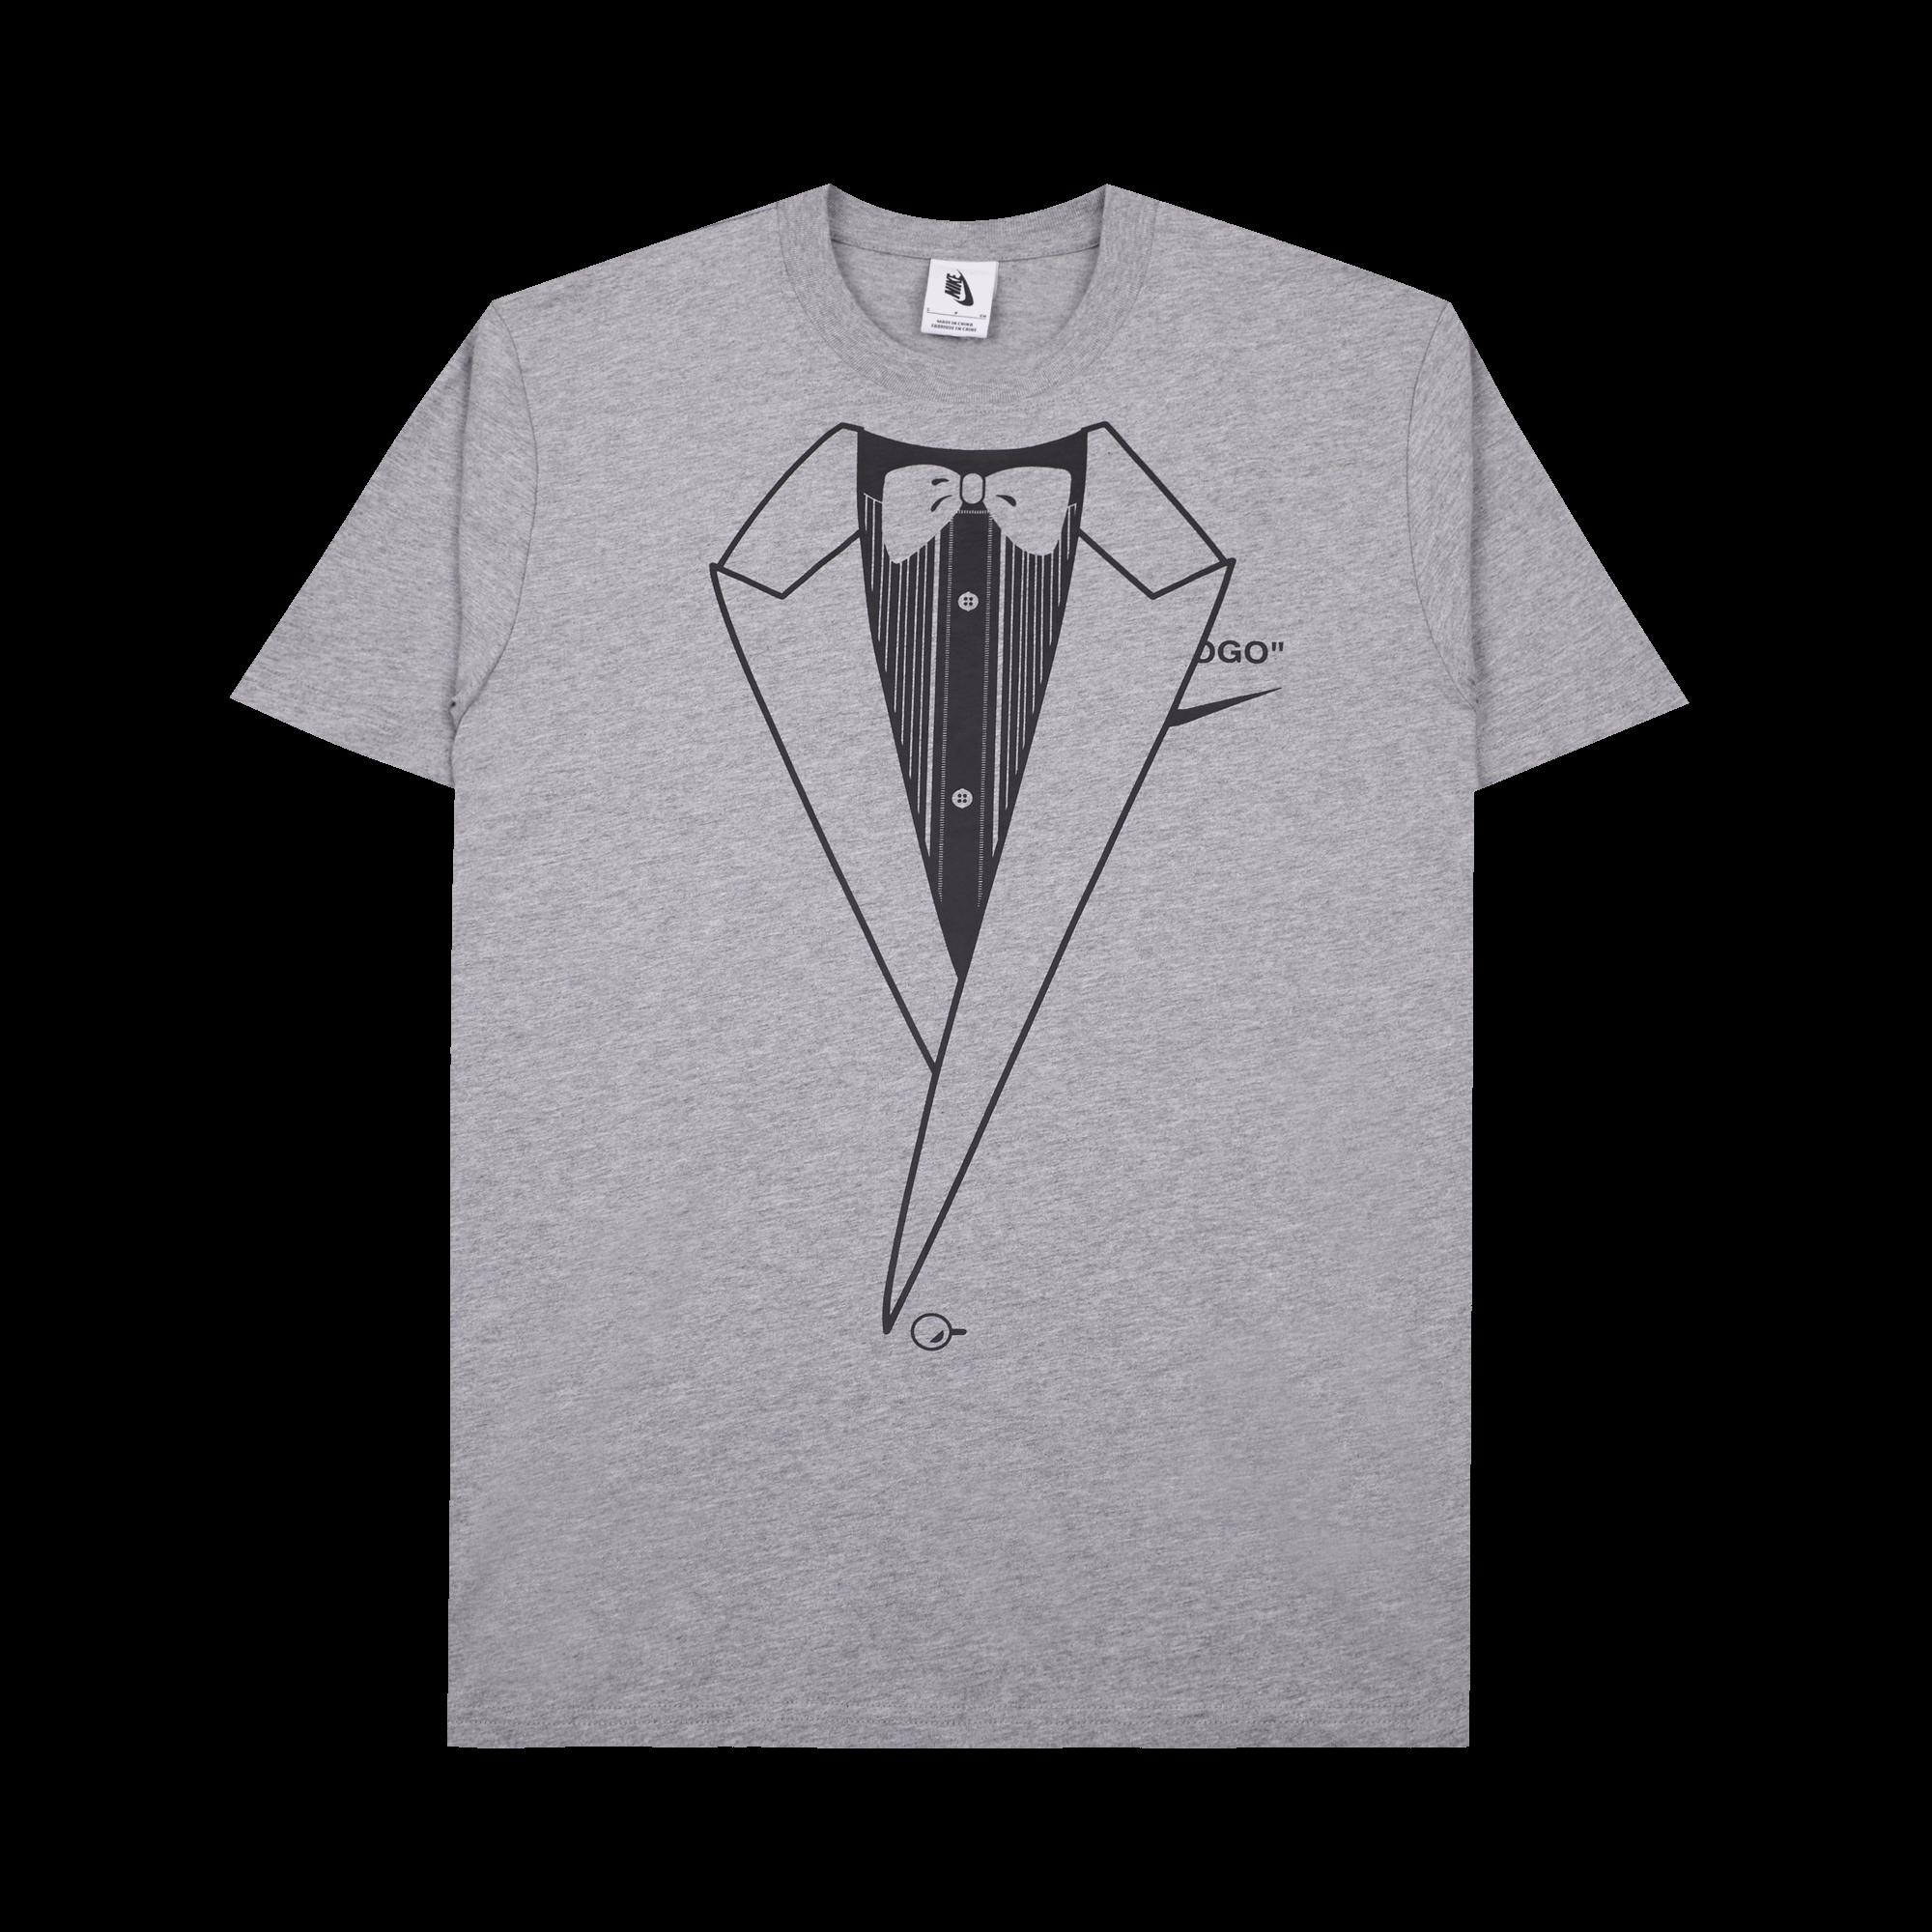 offer discounts wholesale sales new high quality NikeLab M NRG Tee x Off White dark grey / black - T-shirt | Holypopstore.com